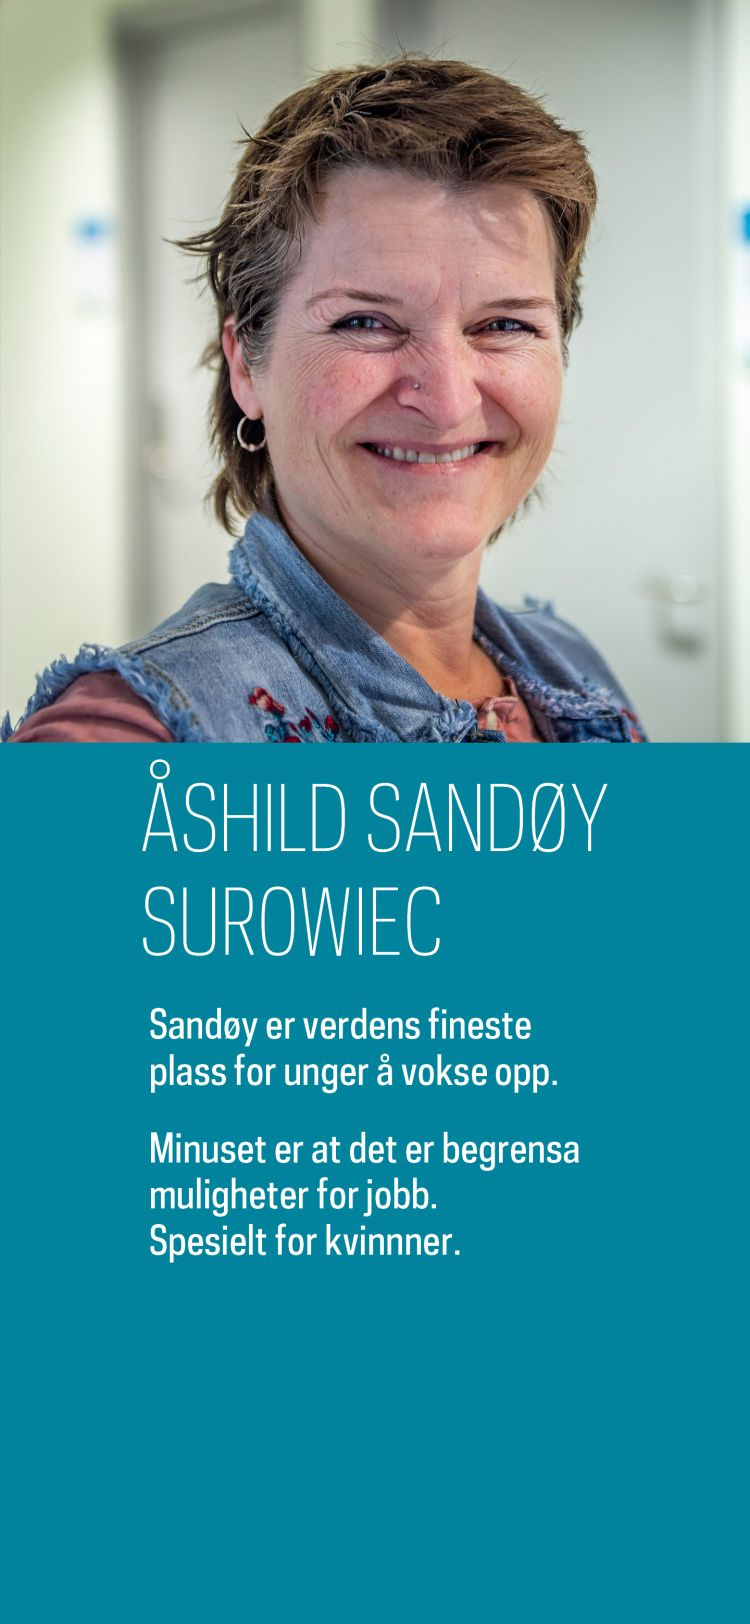 singel i kåfjord ulstein speed dating